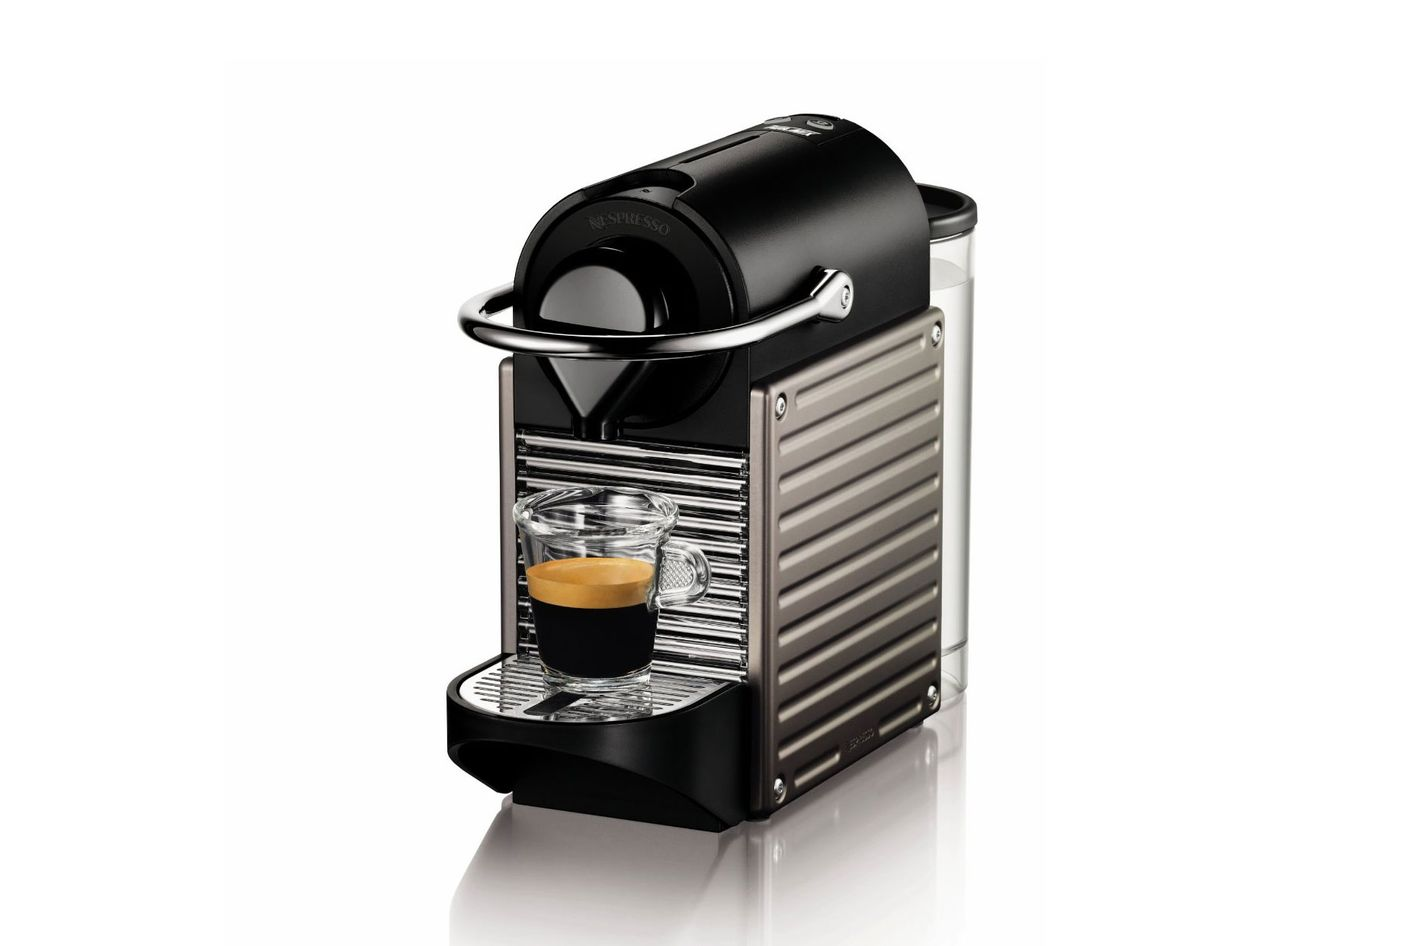 Best Capsule Espresso Machine Nespresso Pixie Espresso Maker